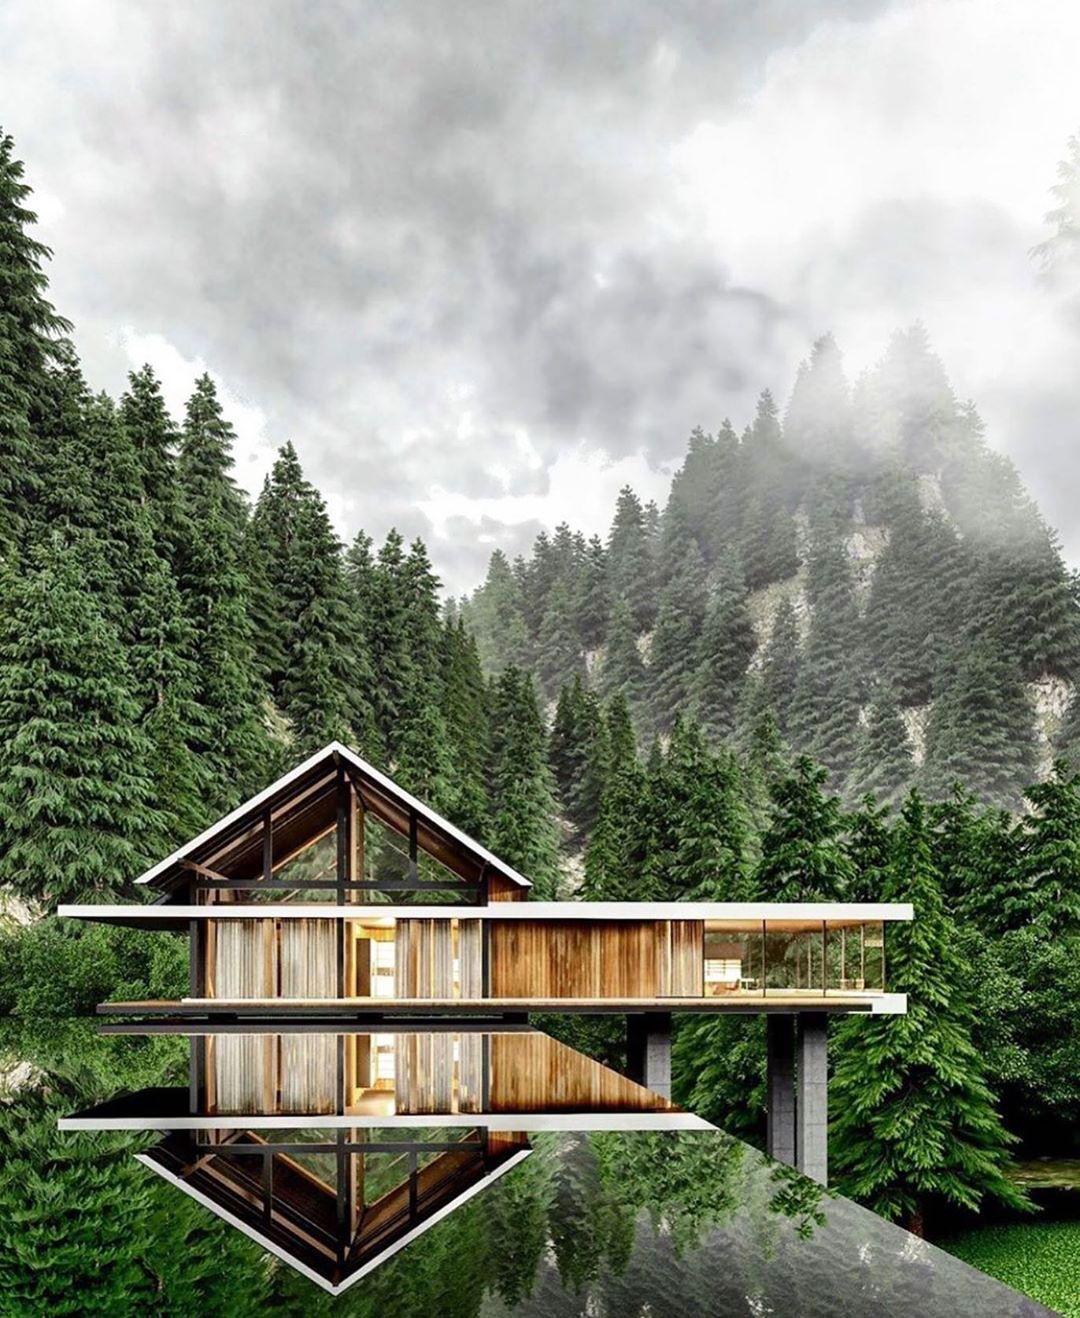 Smallhouse Exterior Ideas: 20 Amazing Small House Decorating Ideas